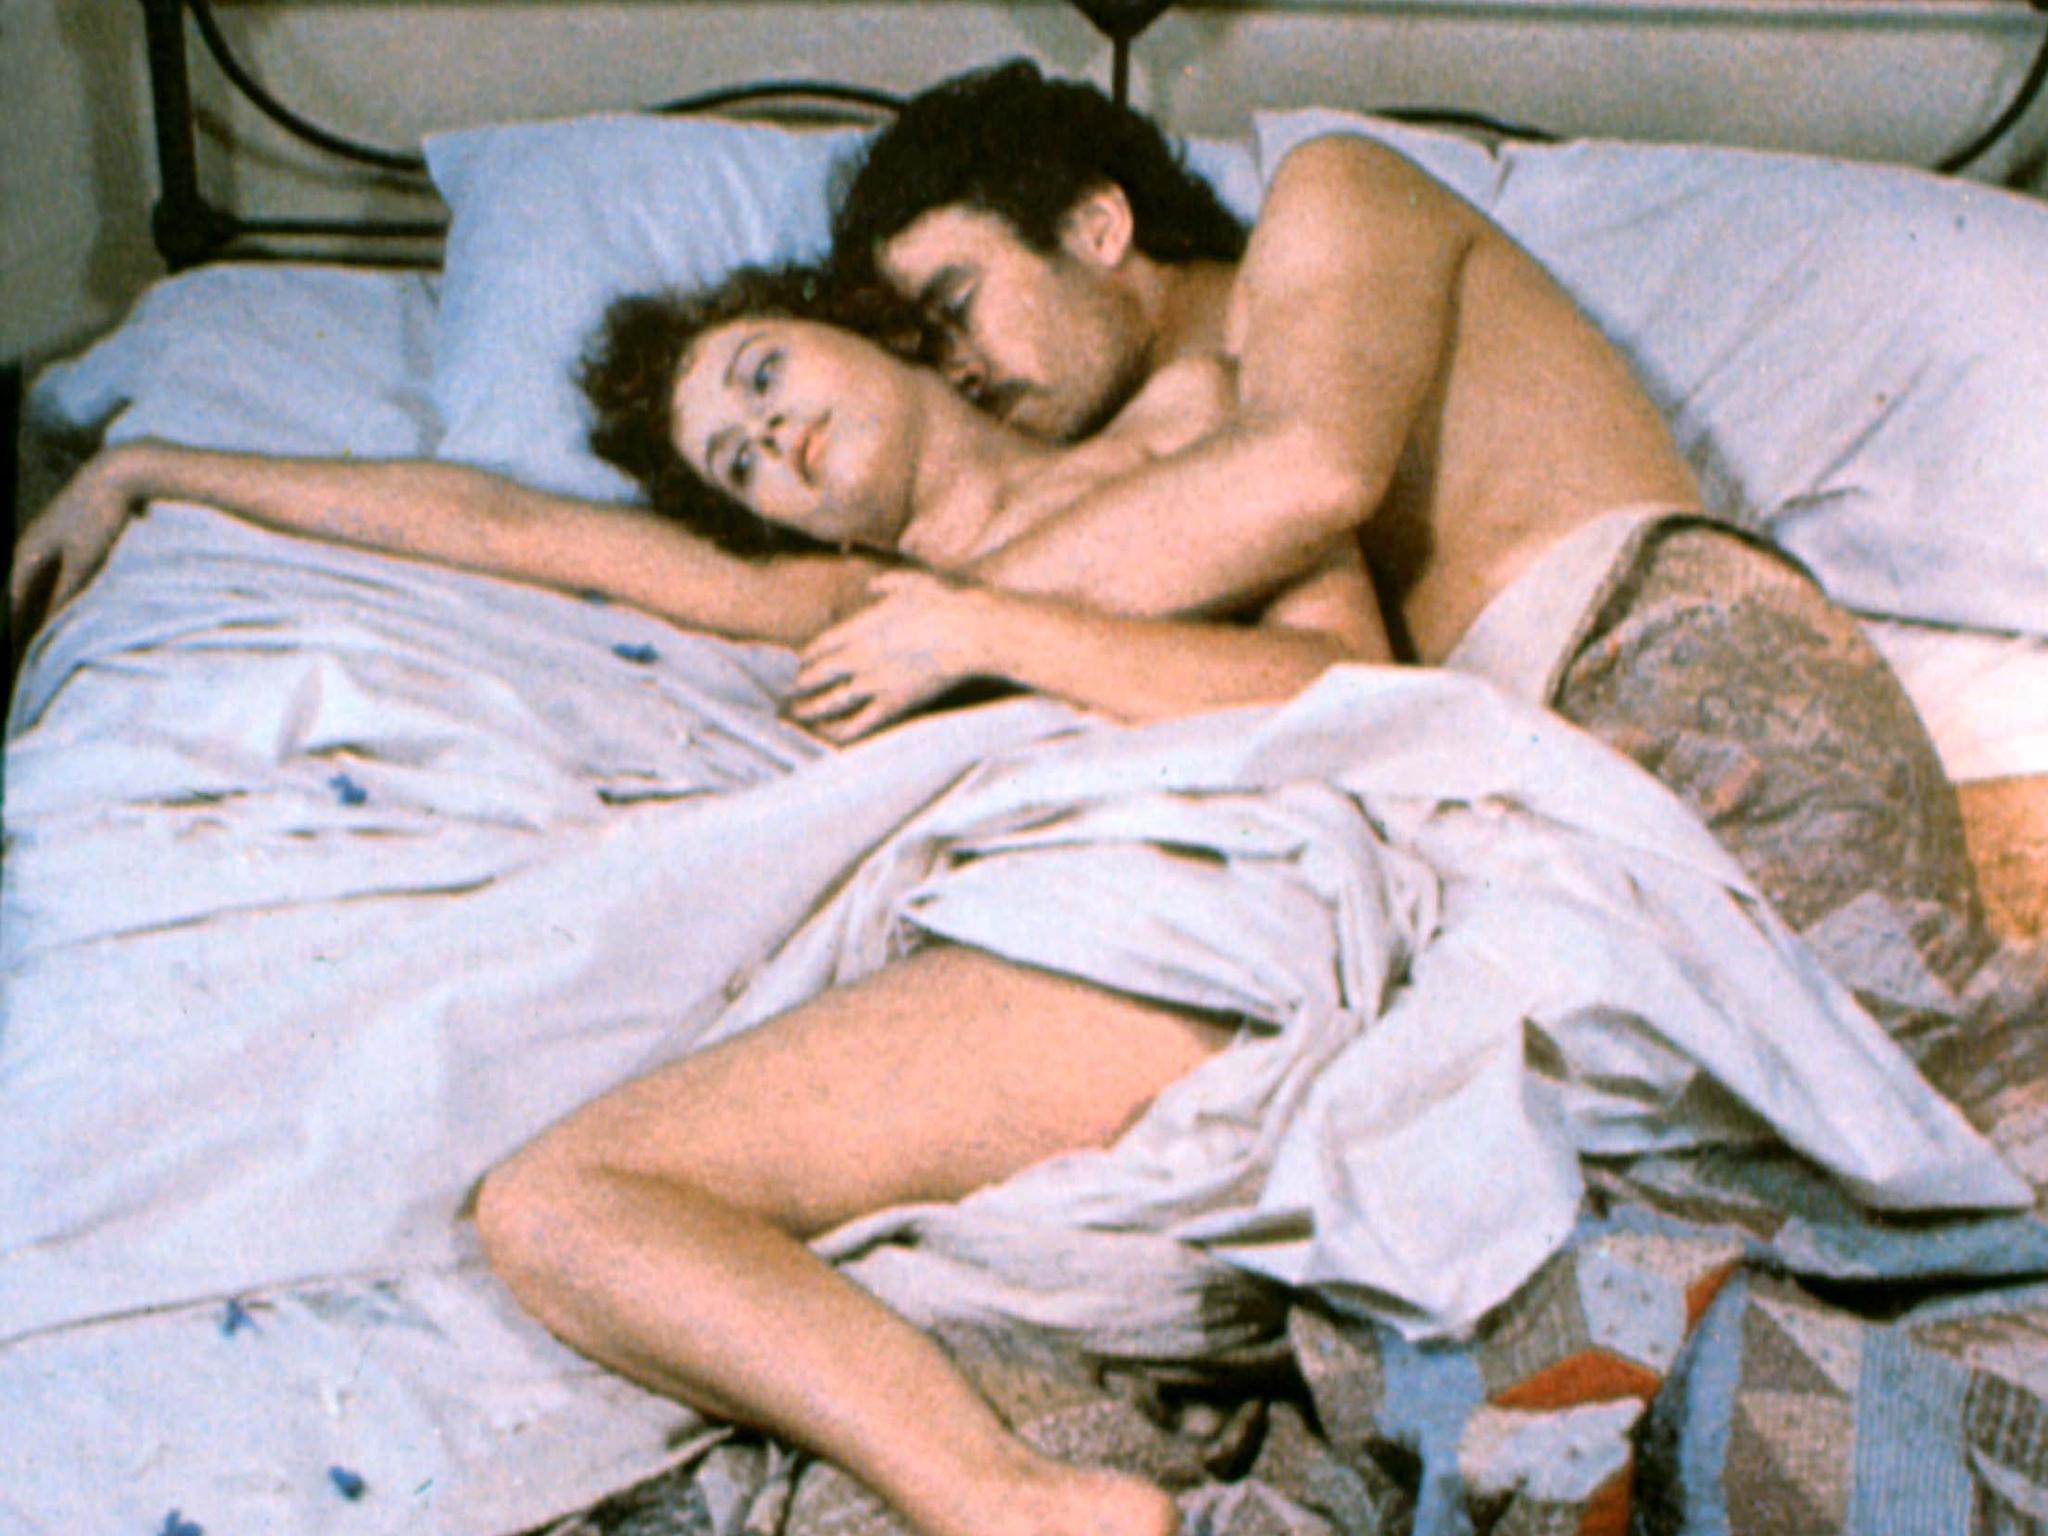 Indie sex taboos tv show ifc